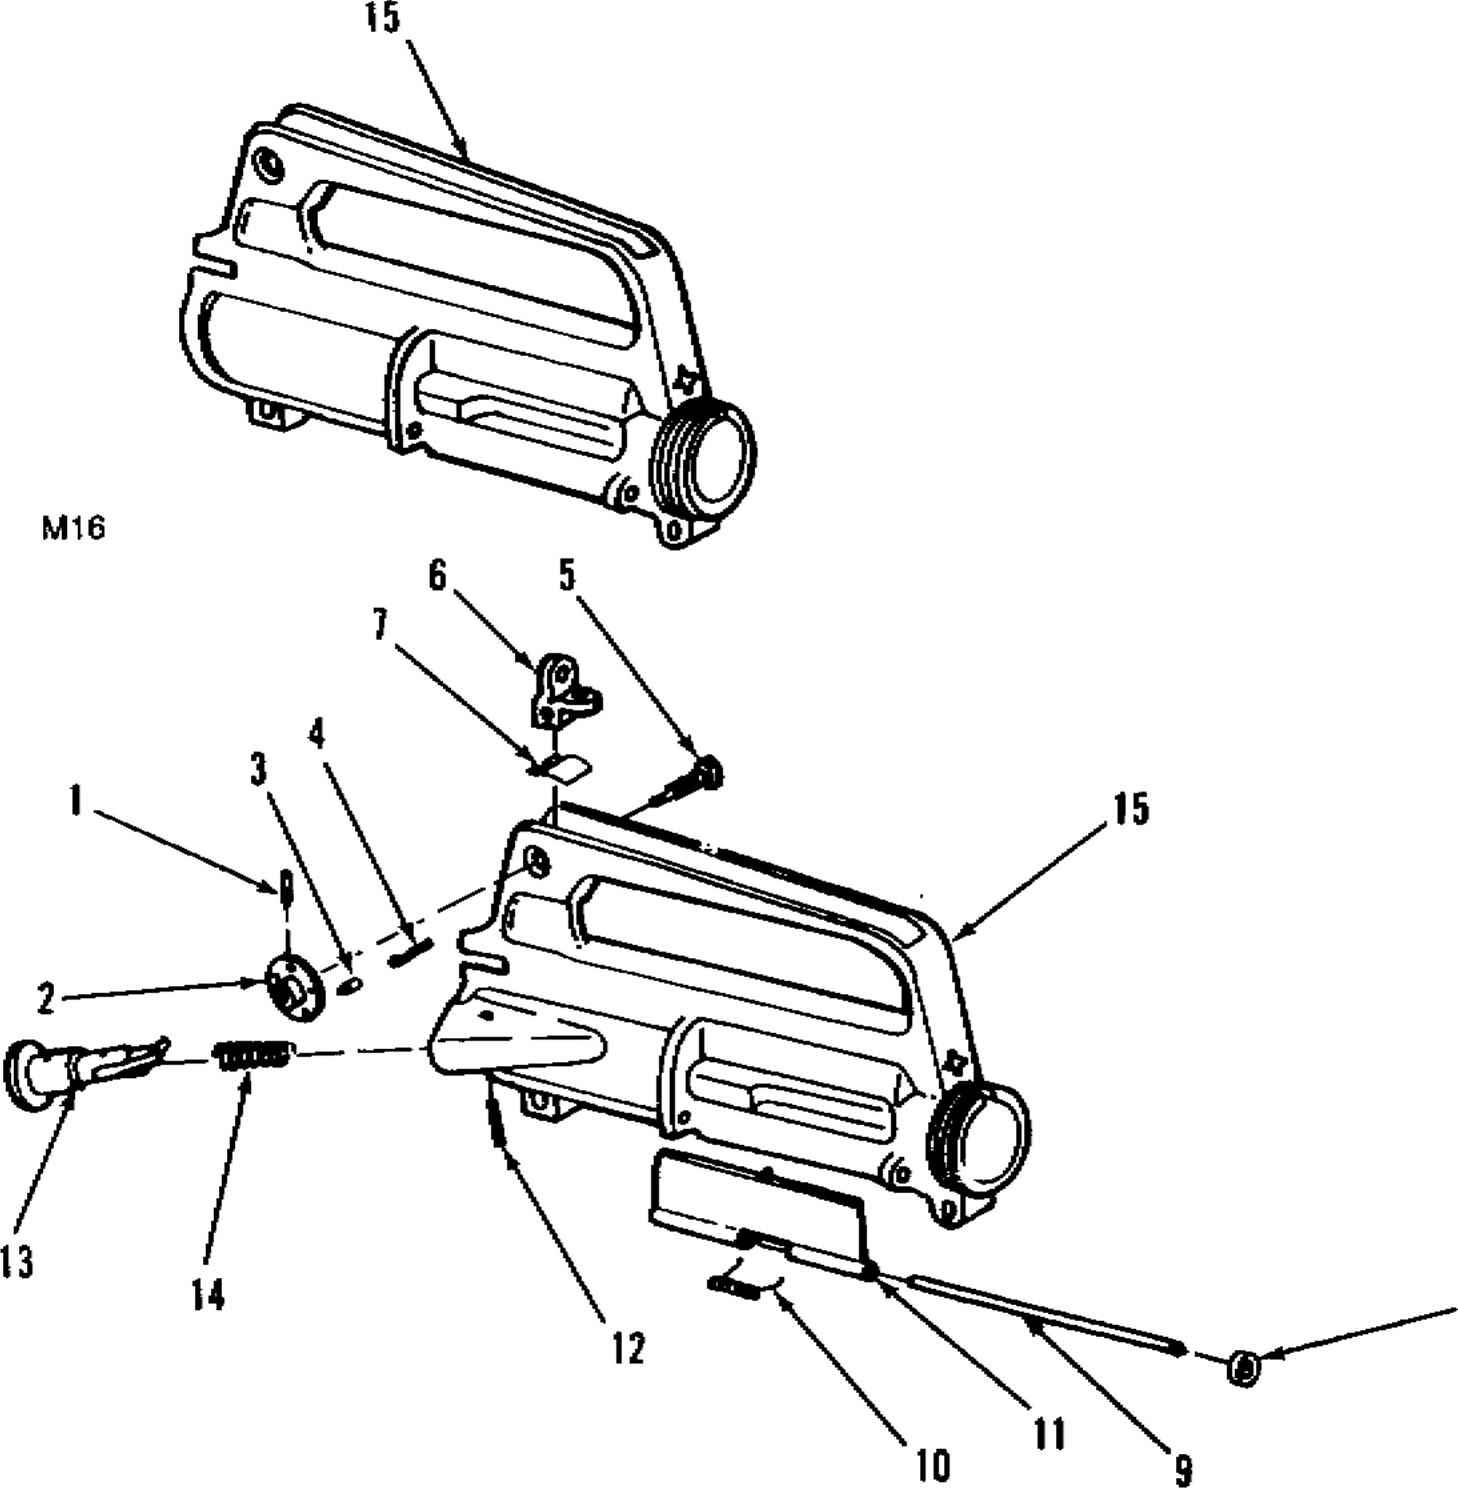 Figure C Rifle Barrel Assembly